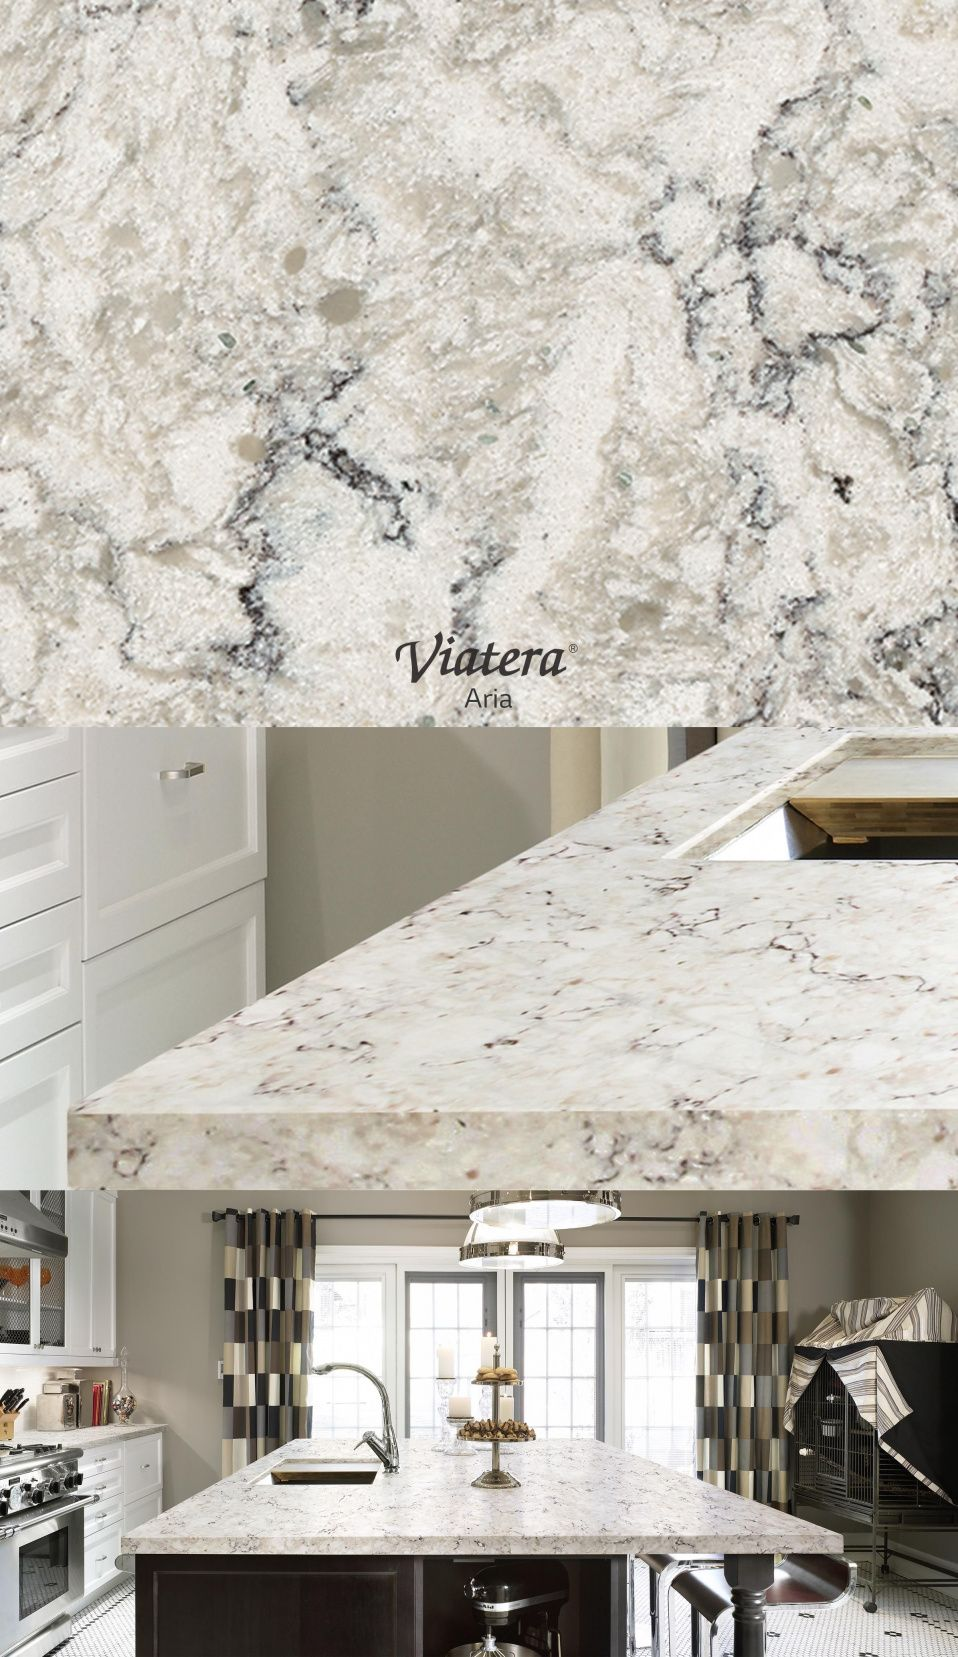 Improvements Non Slip Counter Mat 17 X 14 Silver 27 Pln Liked On Polyvore Featuring Home Kitchen Di Copper Kitchen Accessories Clothes Design Design